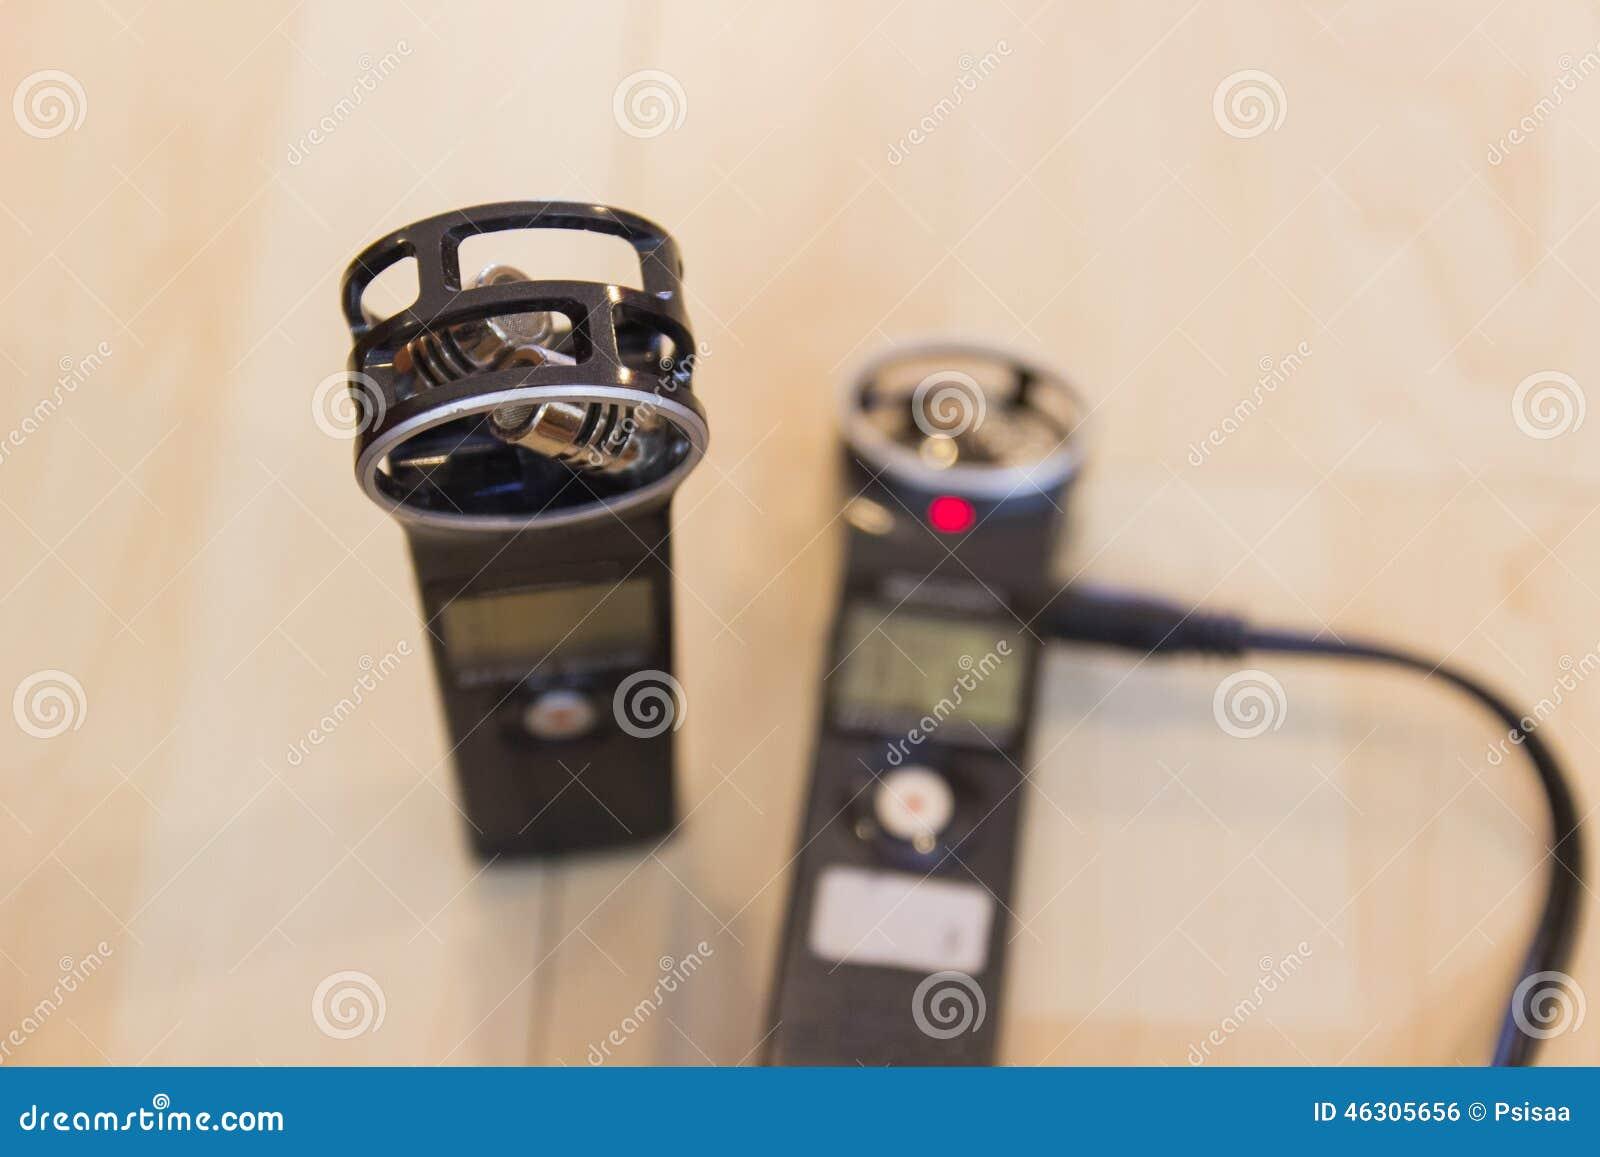 Portable Digital voice Recorder